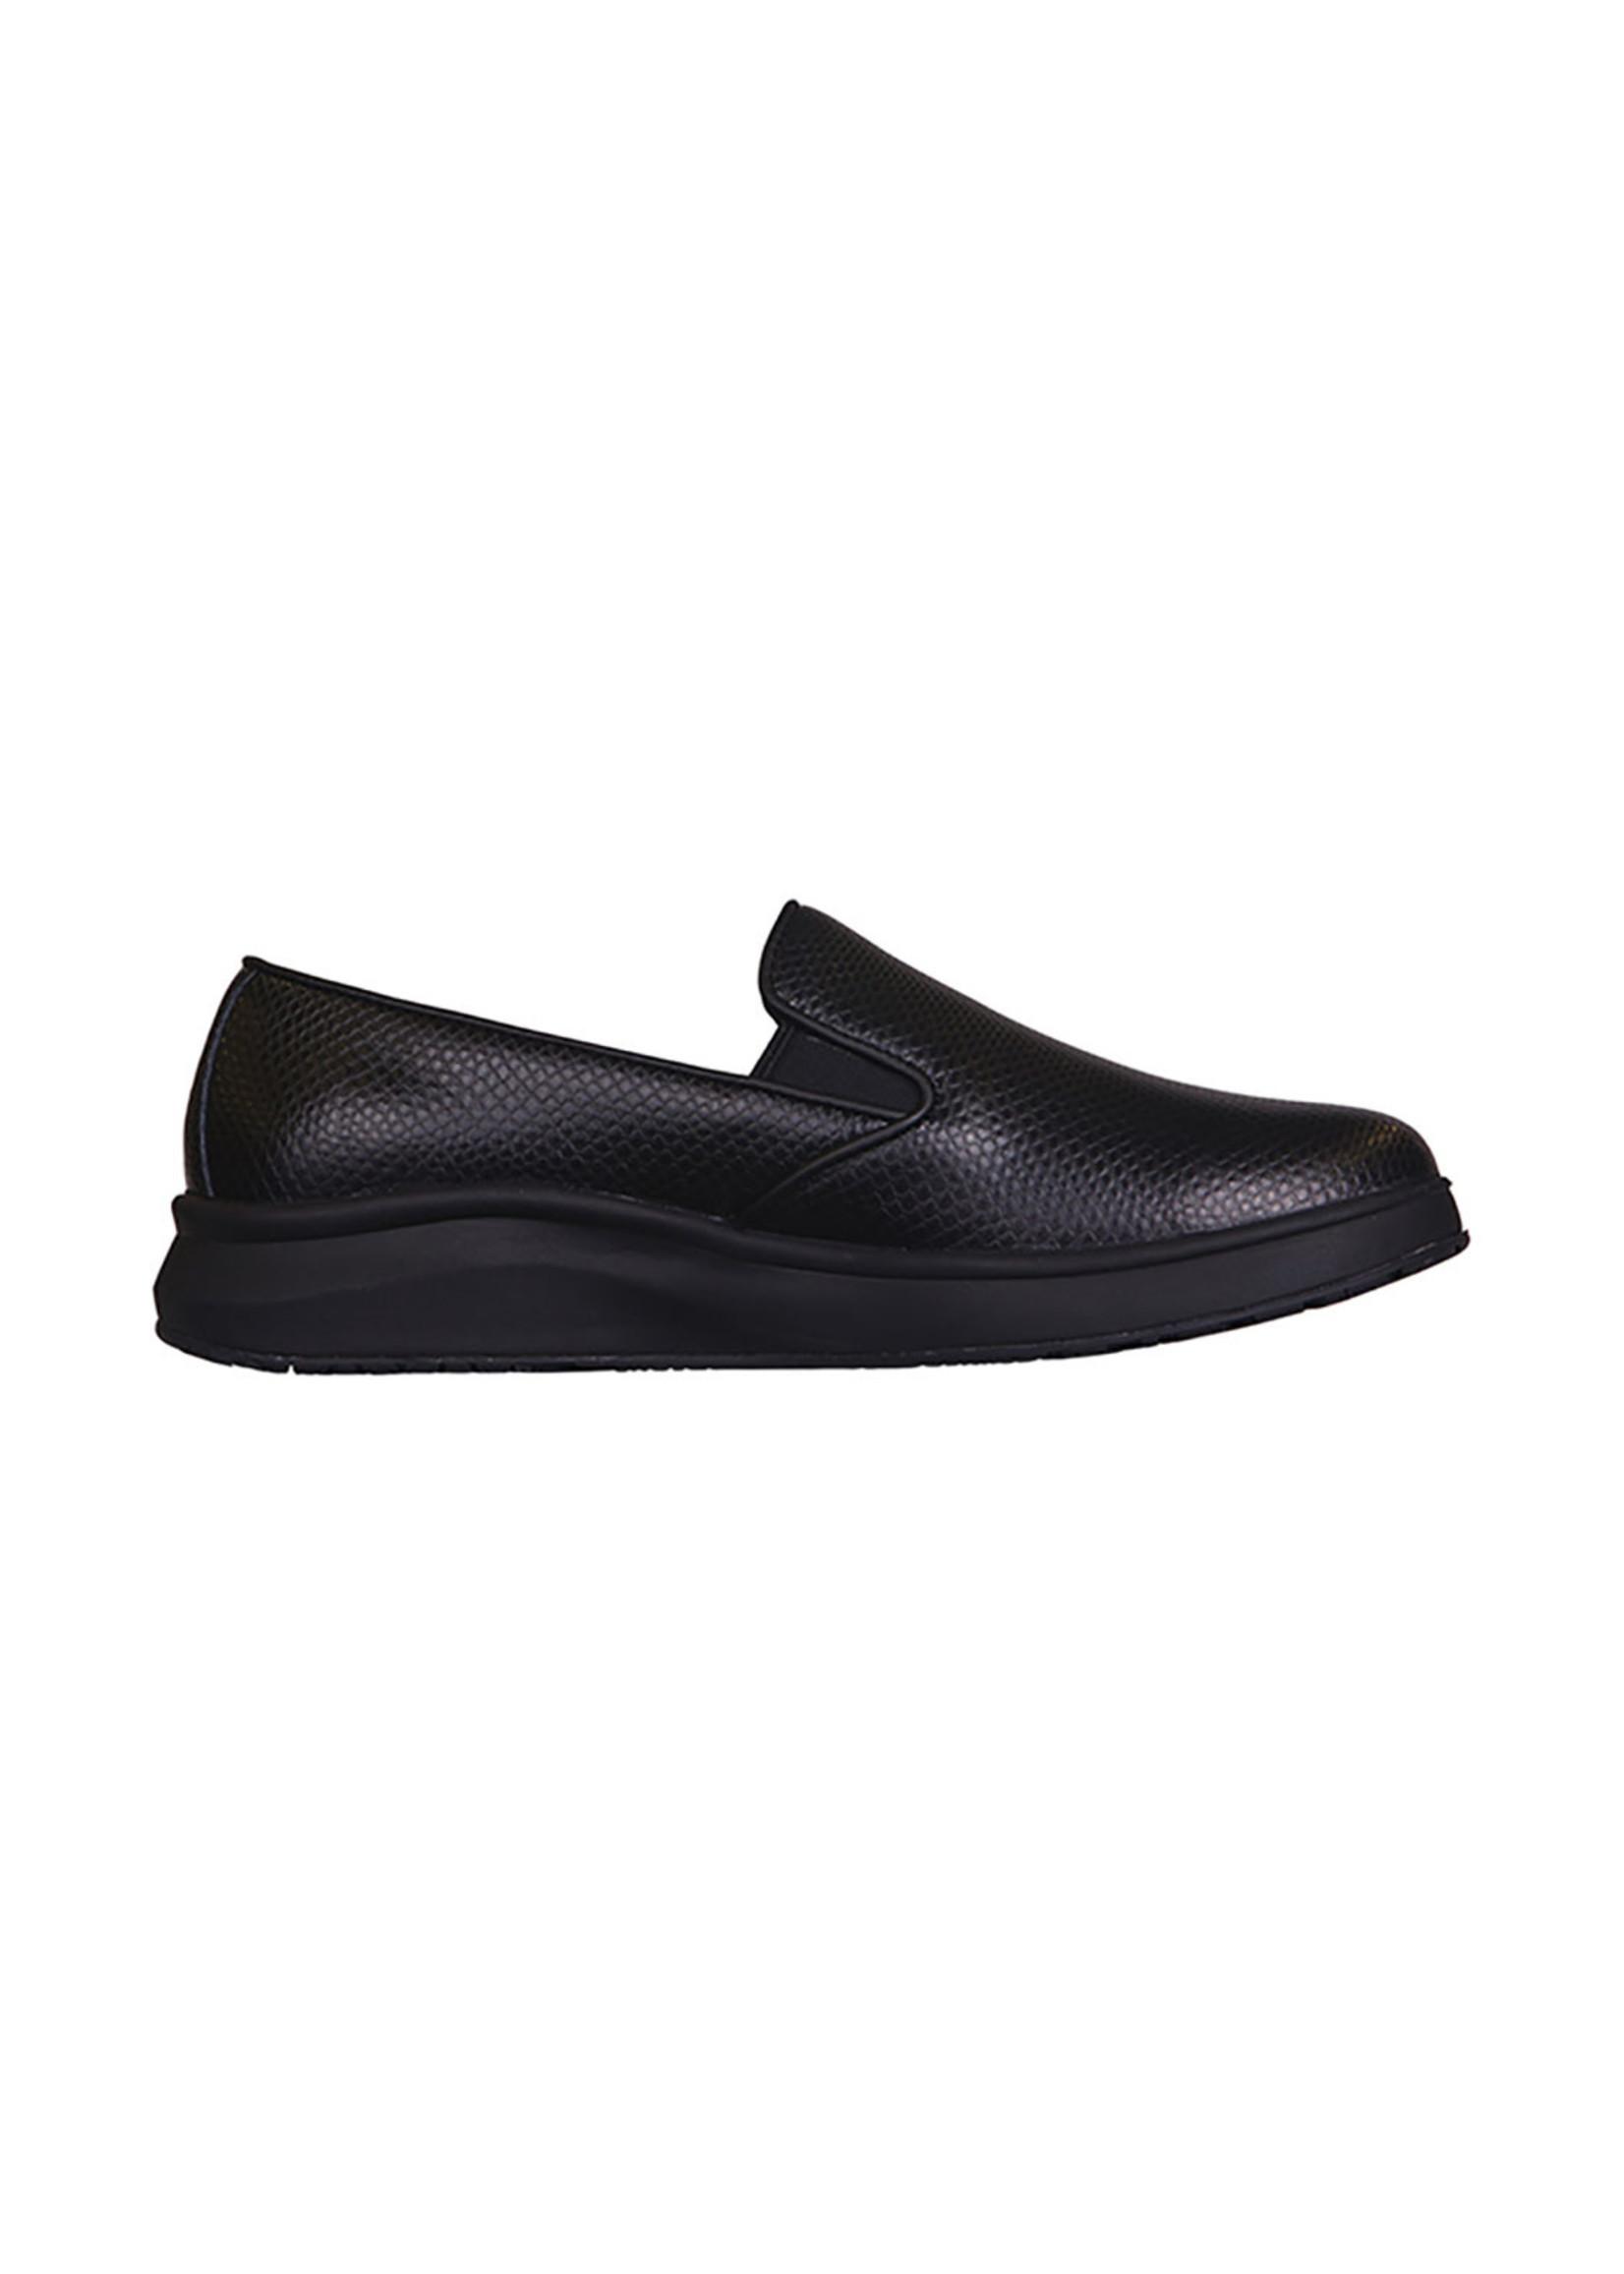 Cherokee Infinity Infinity Footwear Lift - Lift Shoes-Women's